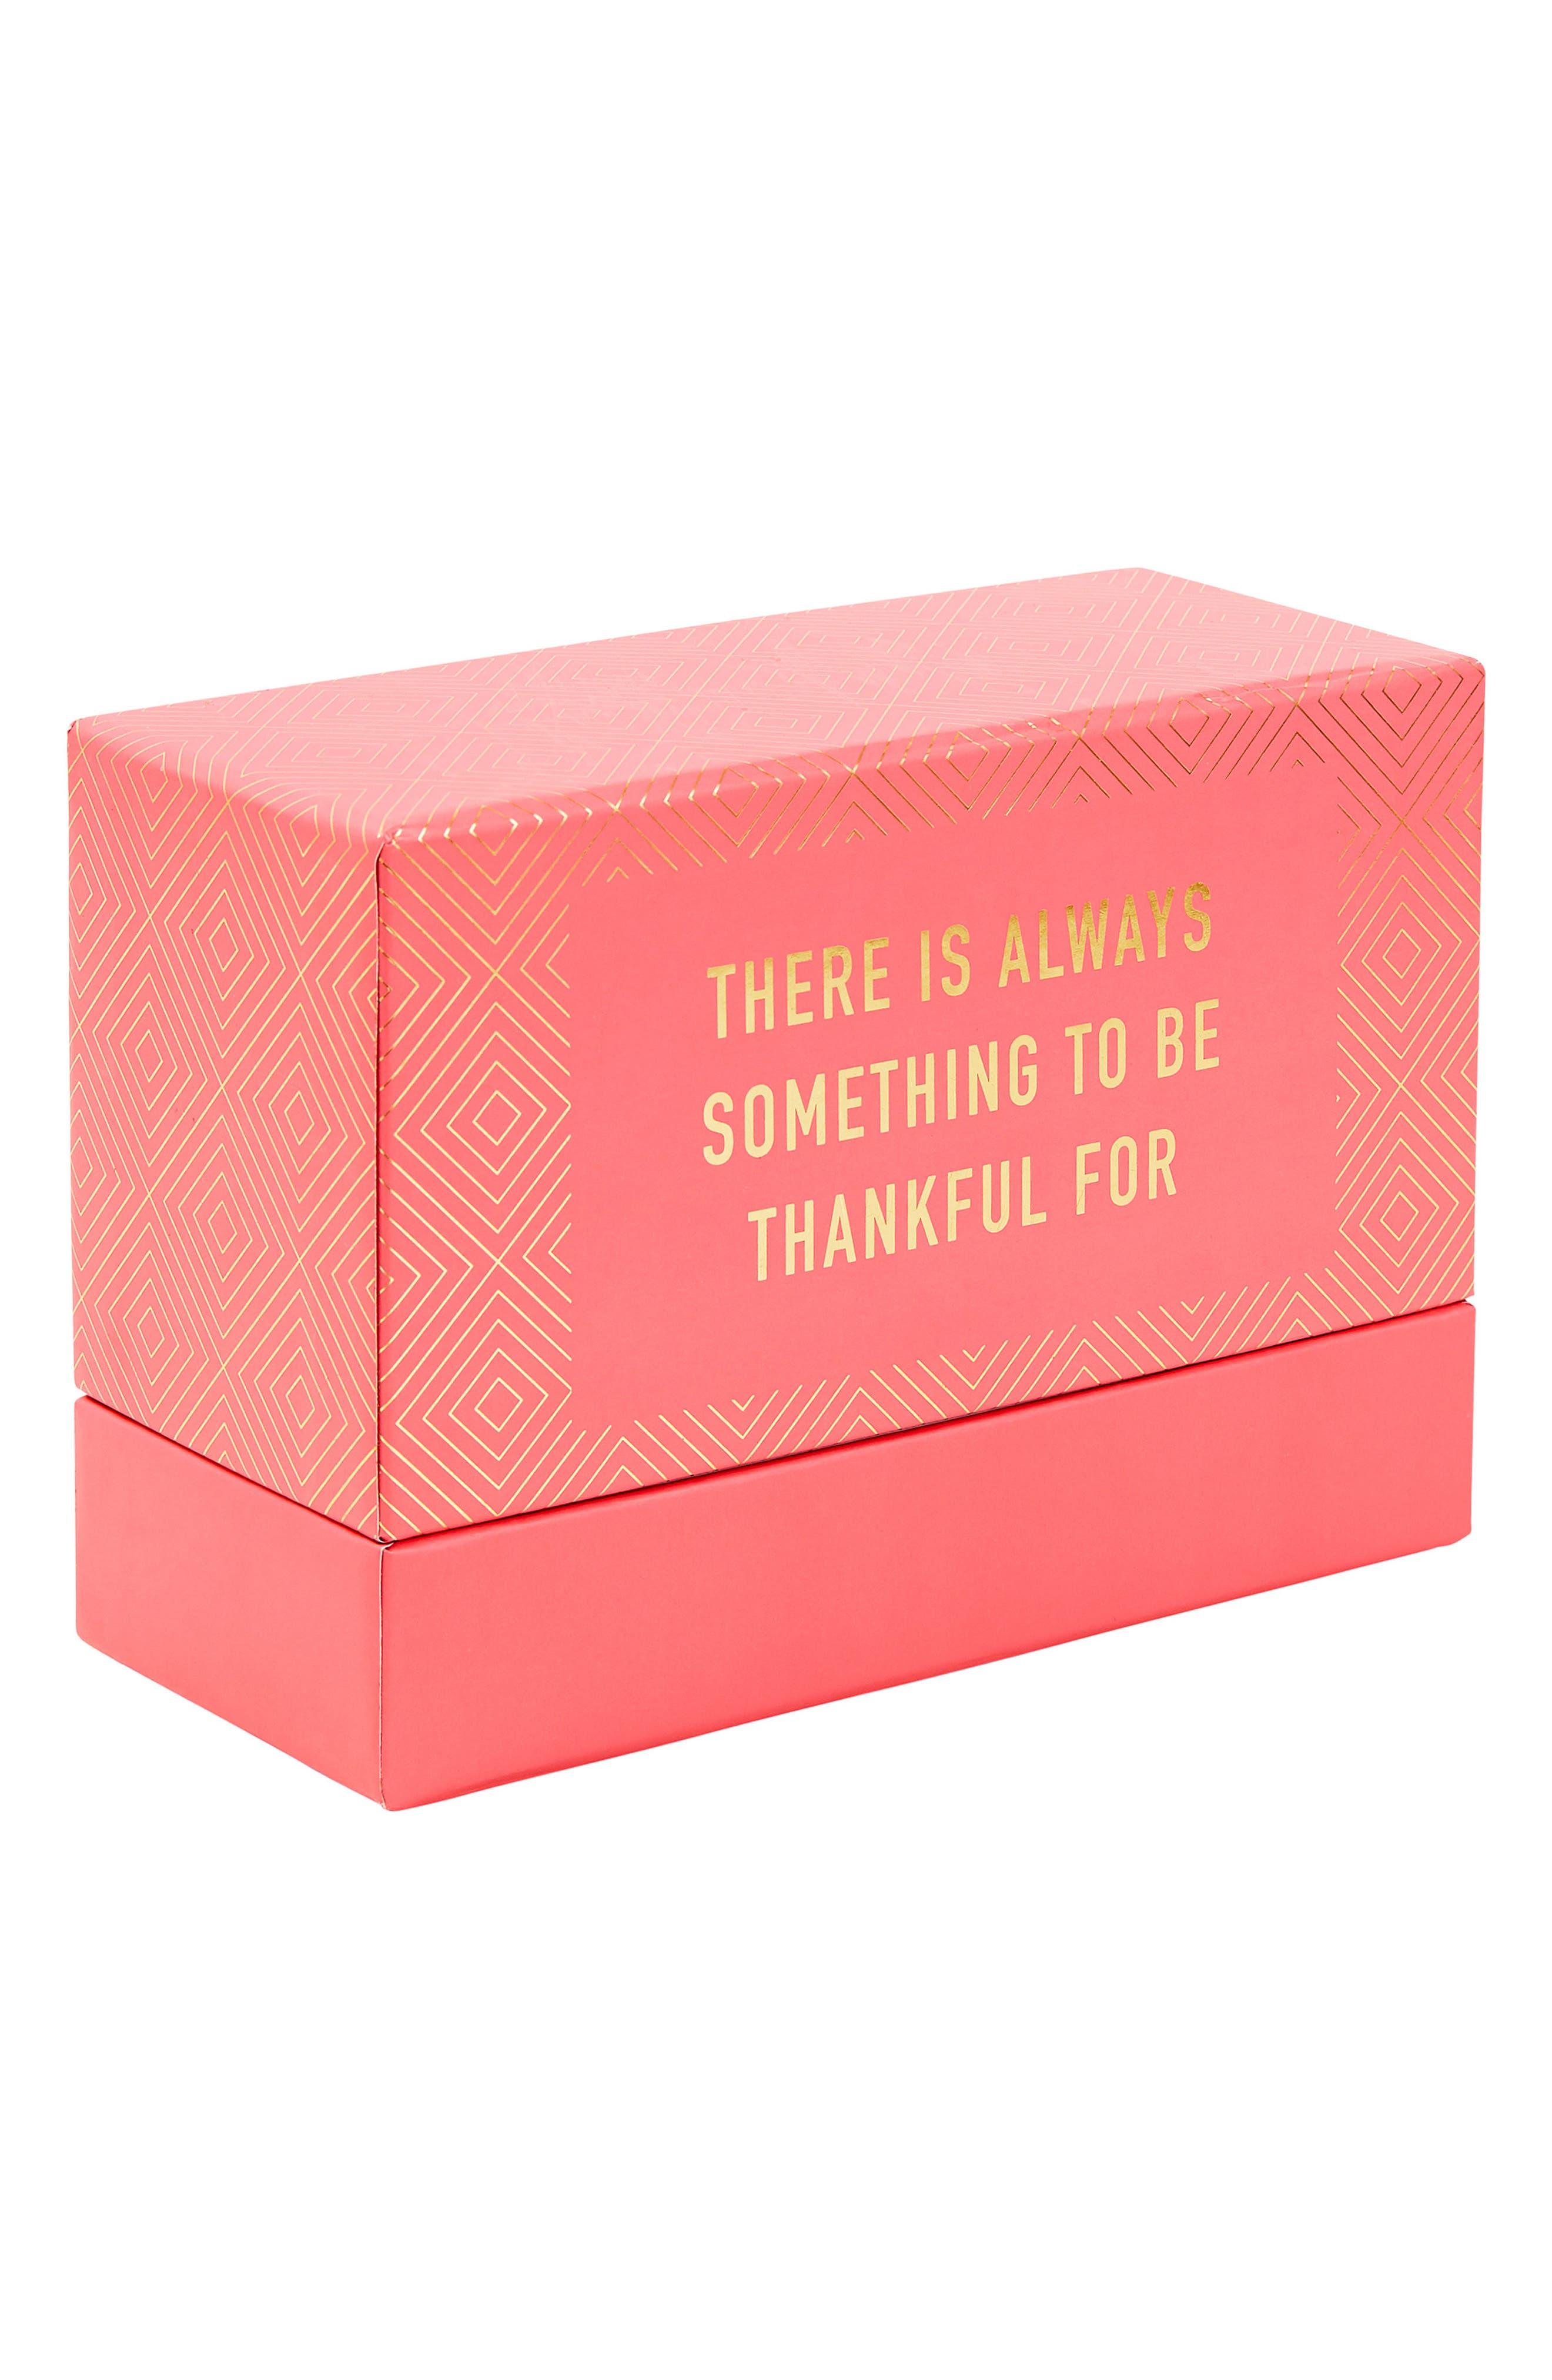 52 Inspirational Cards Box Set,                             Main thumbnail 1, color,                             650